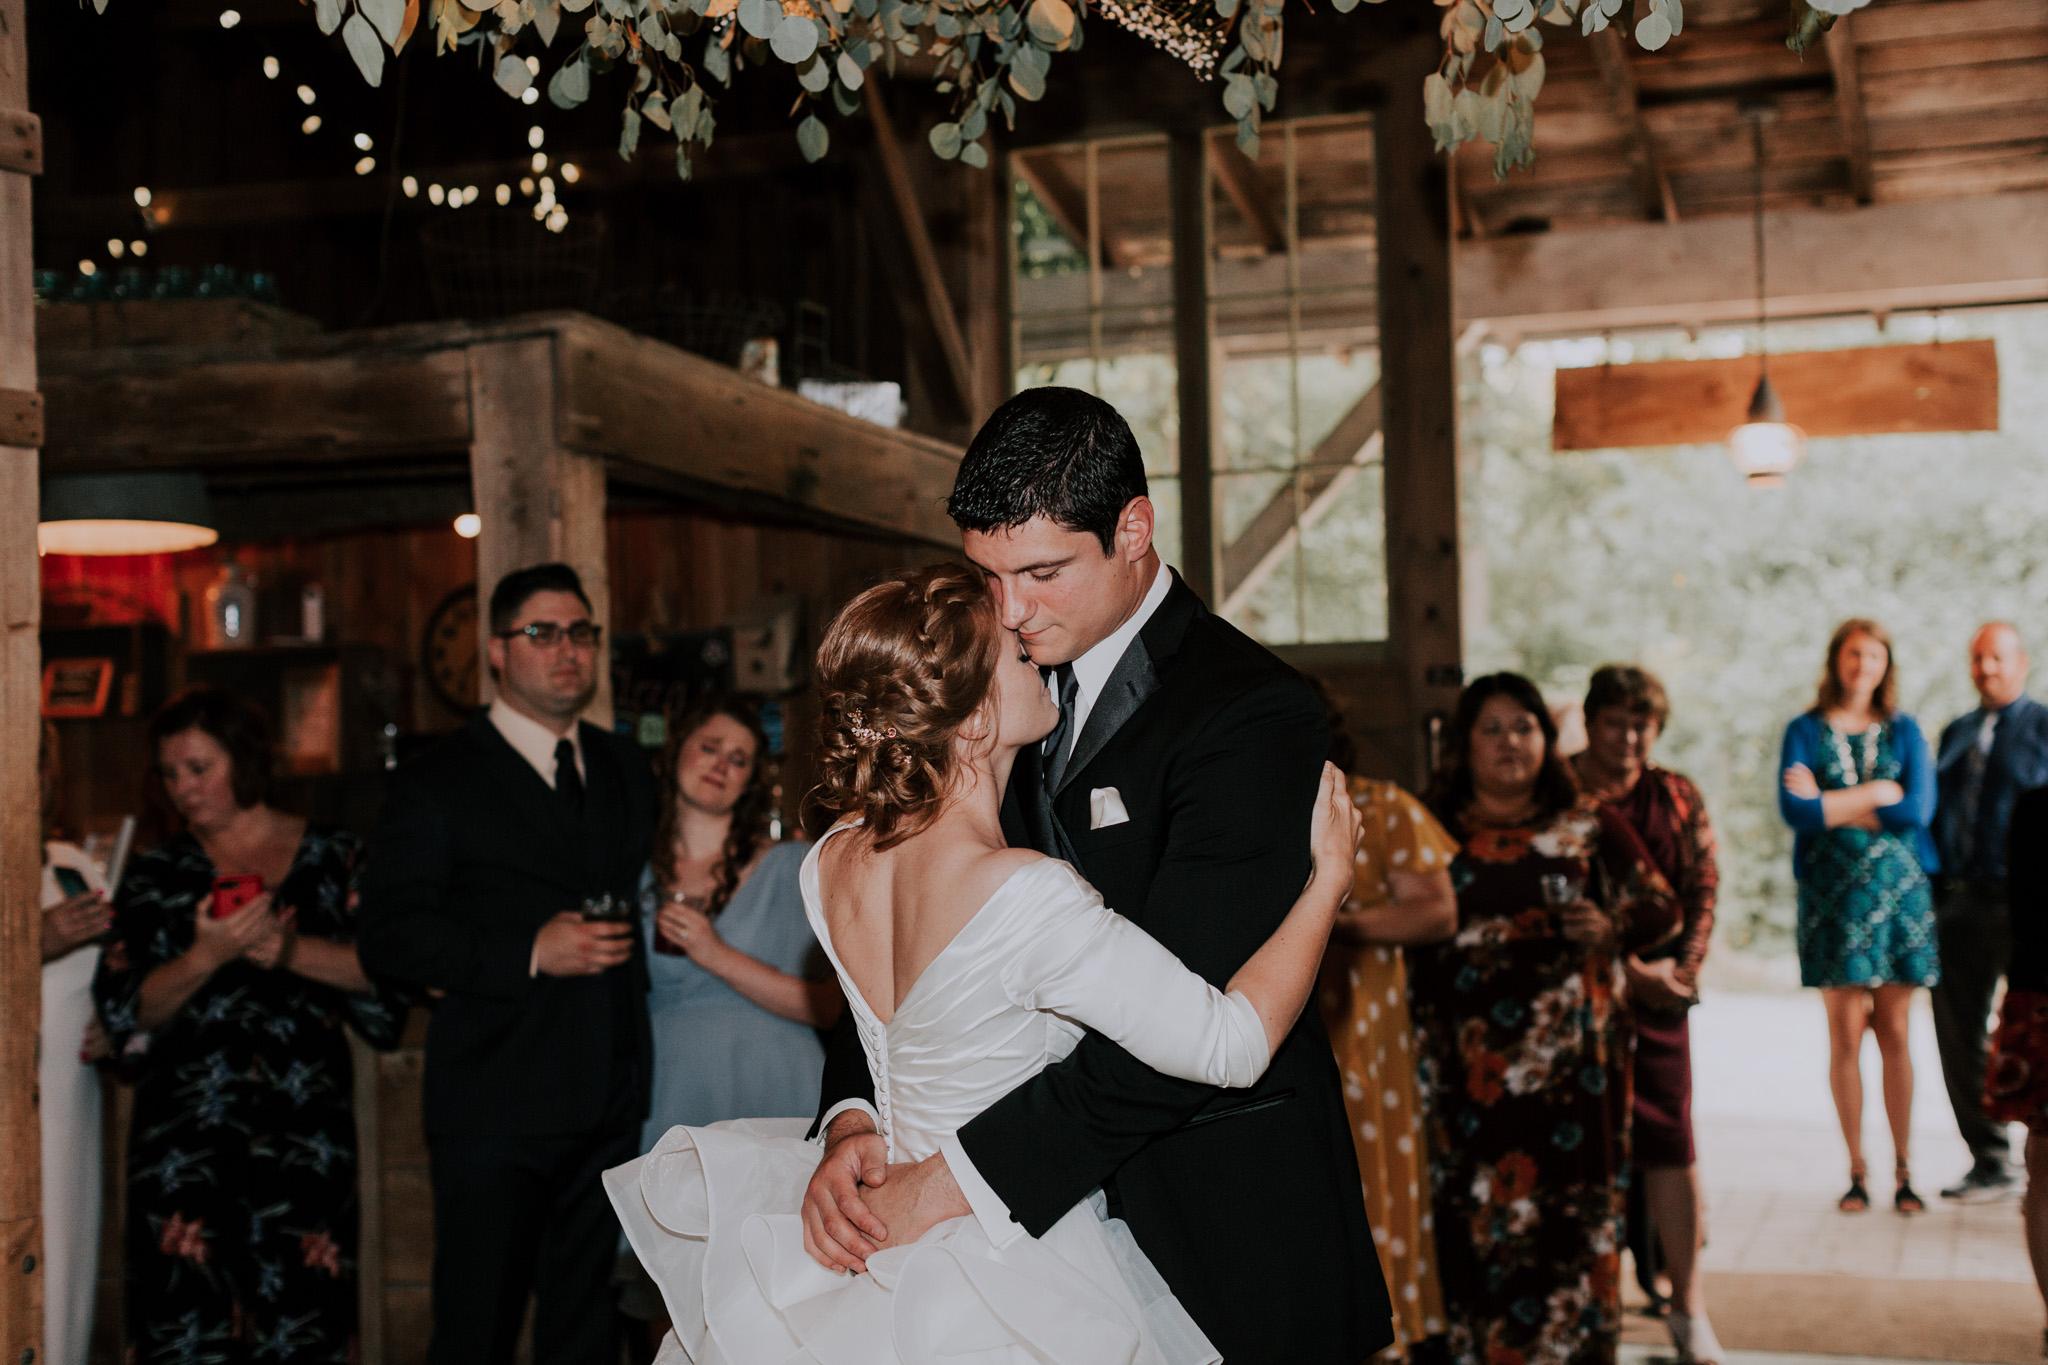 MillCreek-Wilde-Wedding-Barn-Michigan-Eliza-Eric-Vafa-Photo1105.jpg